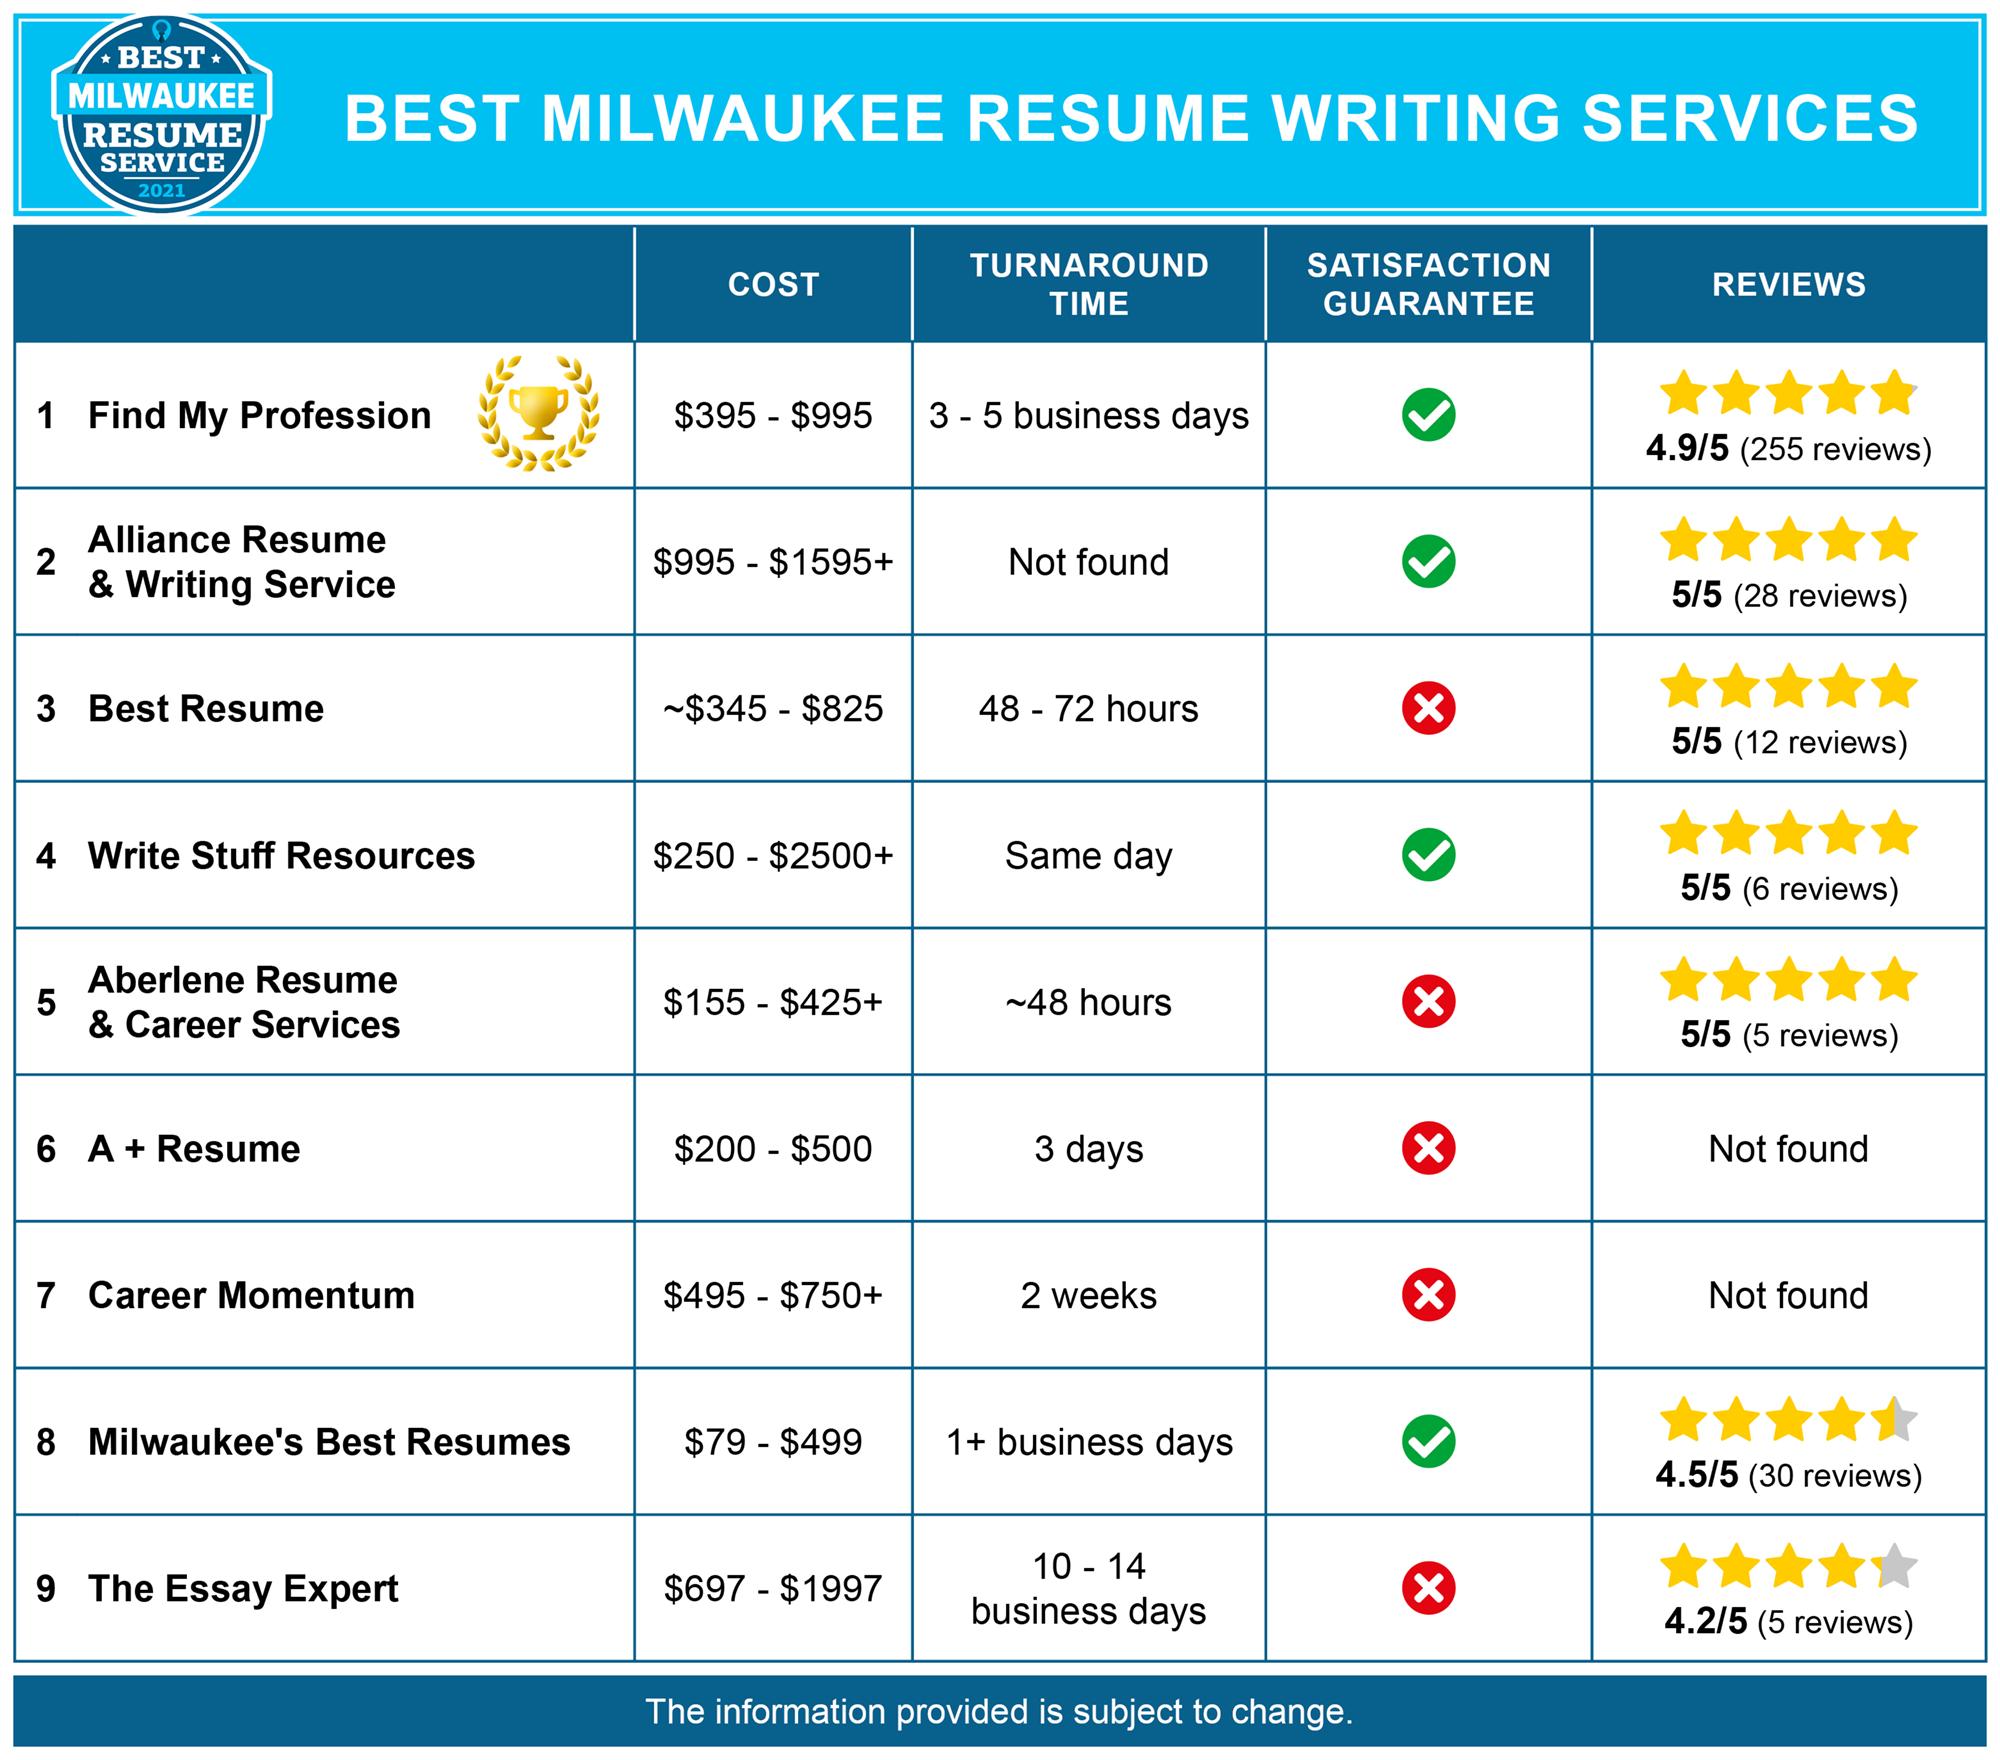 Best Milwaukee Resume Services